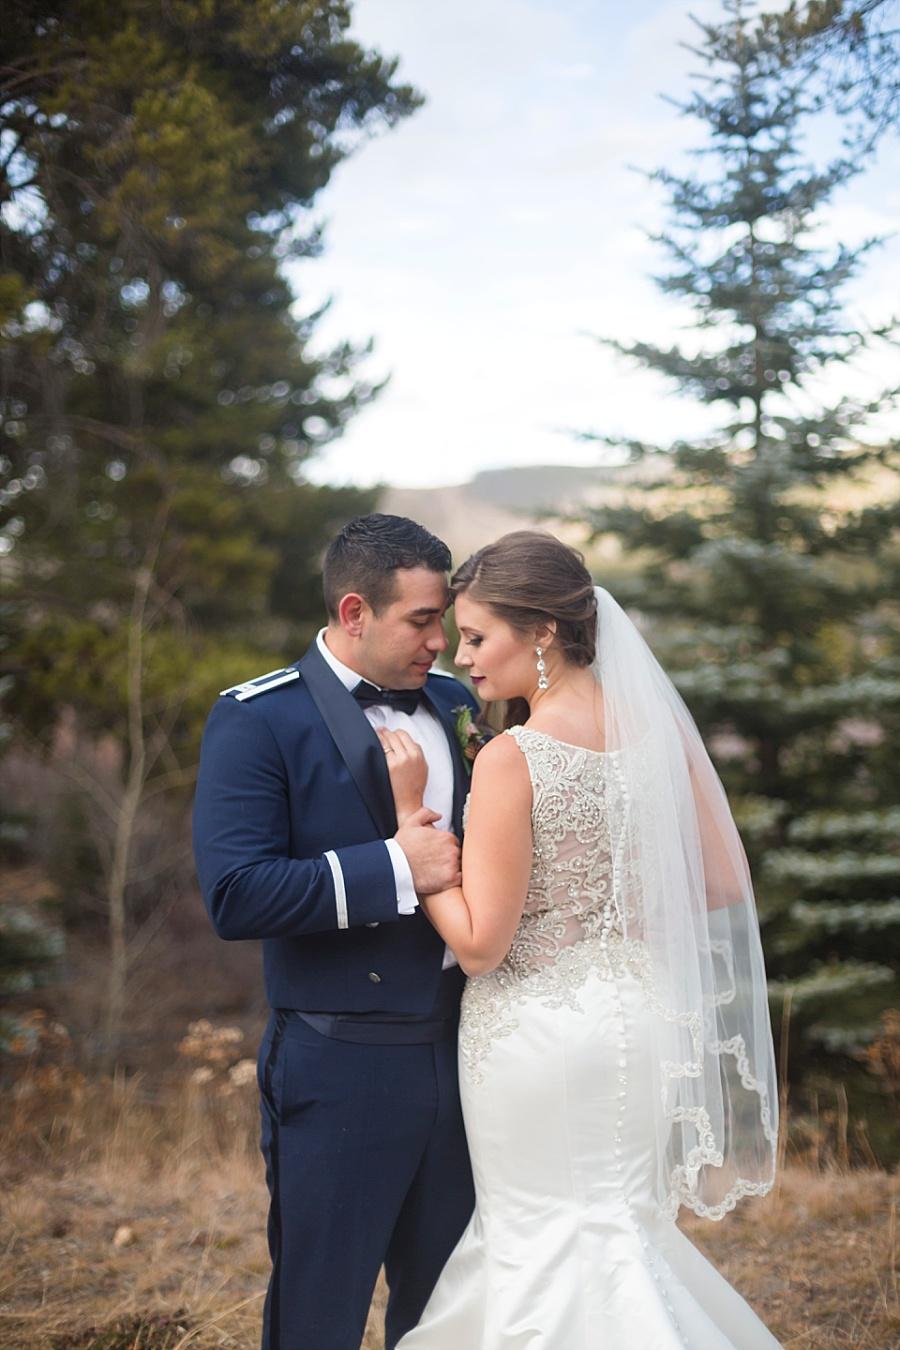 Stacy Anderson Photography Breckenridge Denver Boulder Vail Colorado Travel Lifestyle Elopement Vow renewal Family Wedding Photographer_0017.jpg